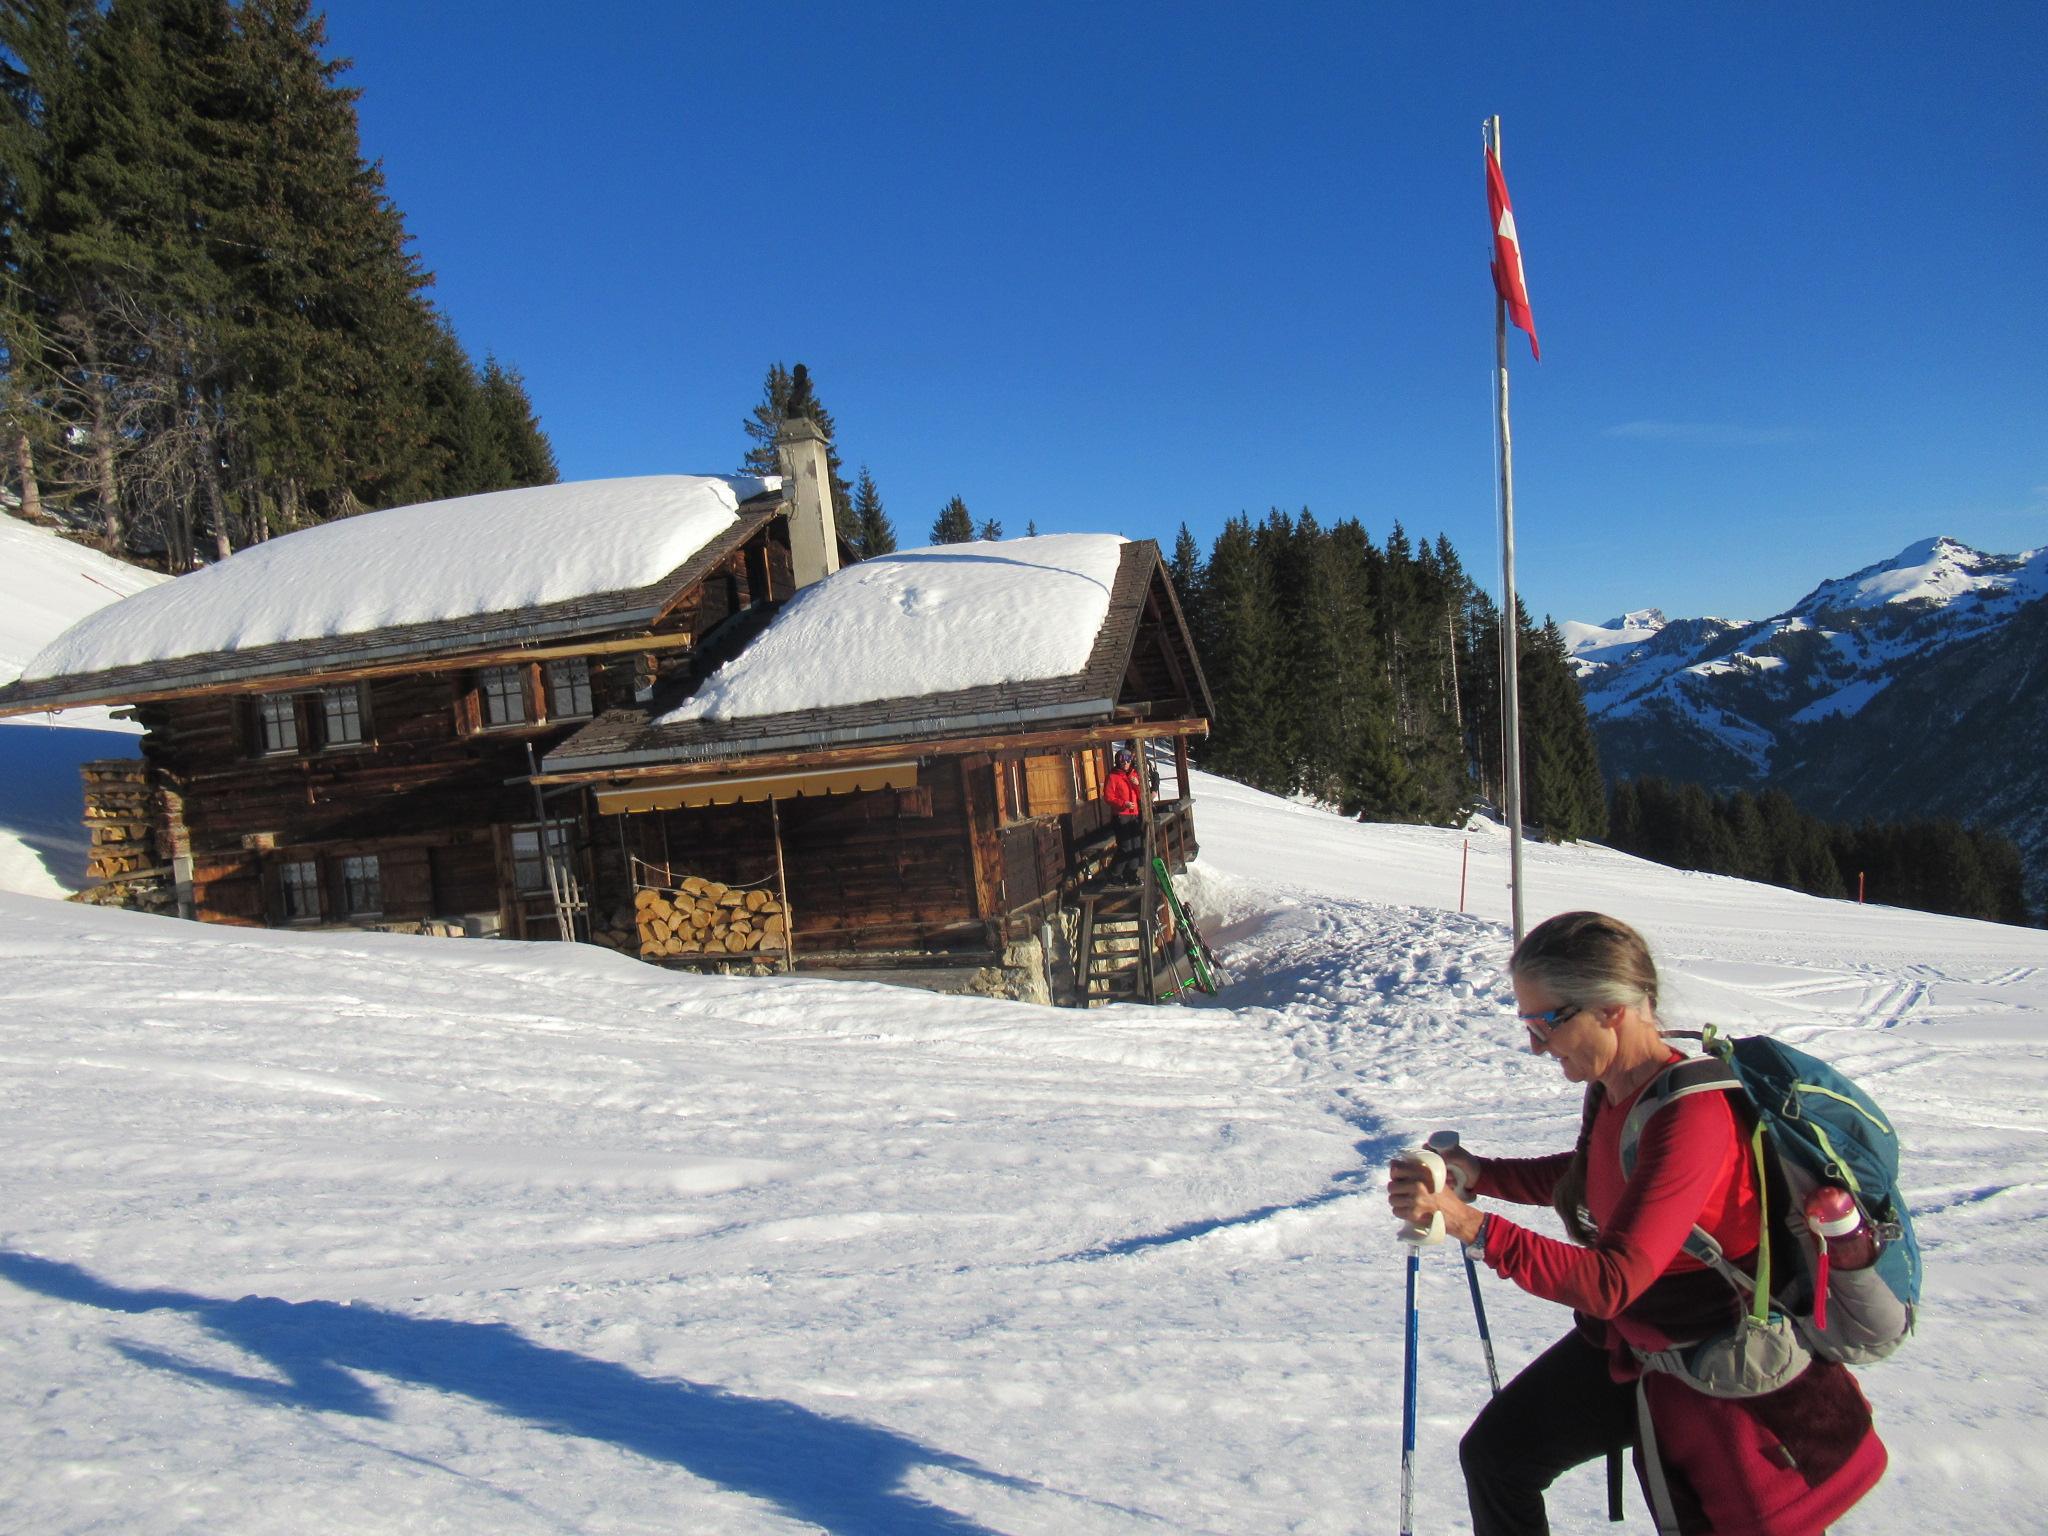 Hüttliweekend und Schneeschuhtour Amsleregrat 17.02.2019